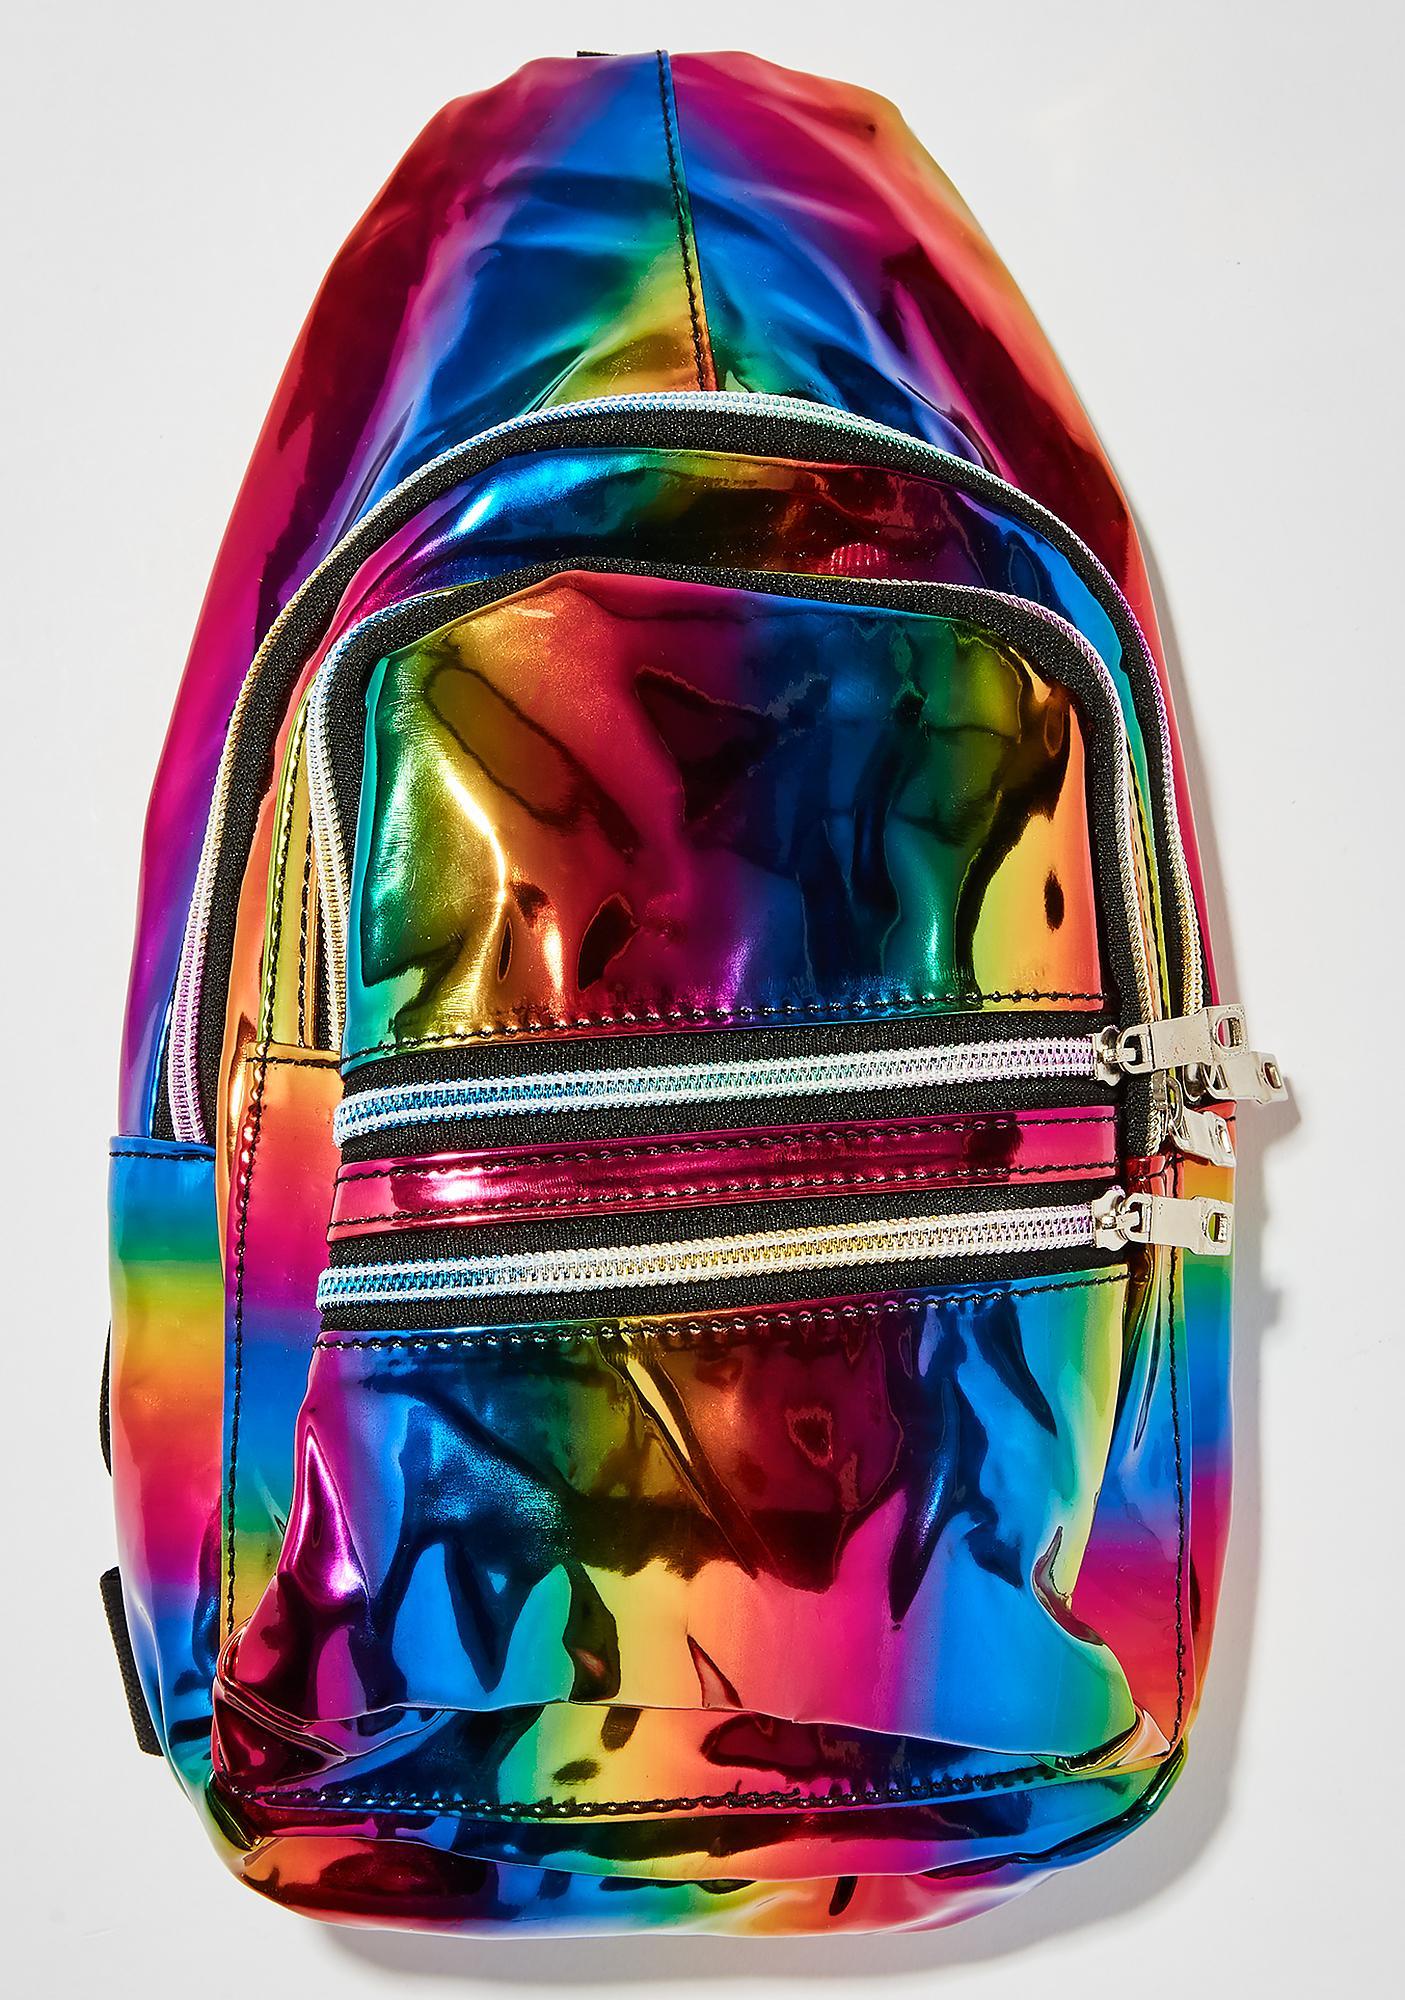 Prismatic Rainbow Sling Bag